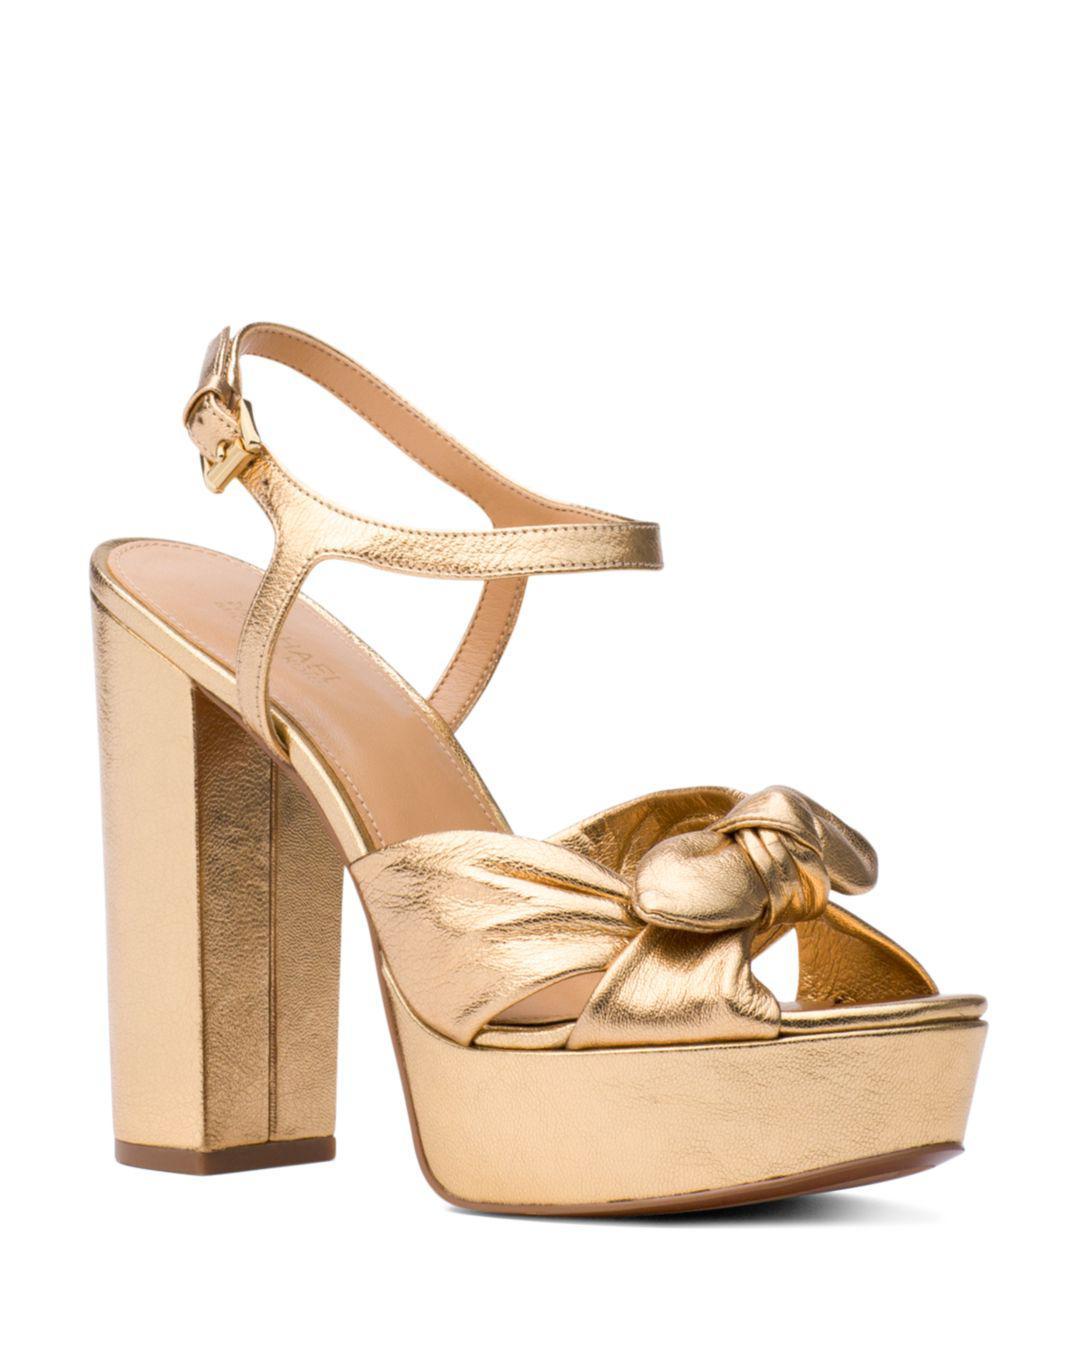 44b04c6d02 MICHAEL Michael Kors Women's Pippa Leather Platform High-heel ...